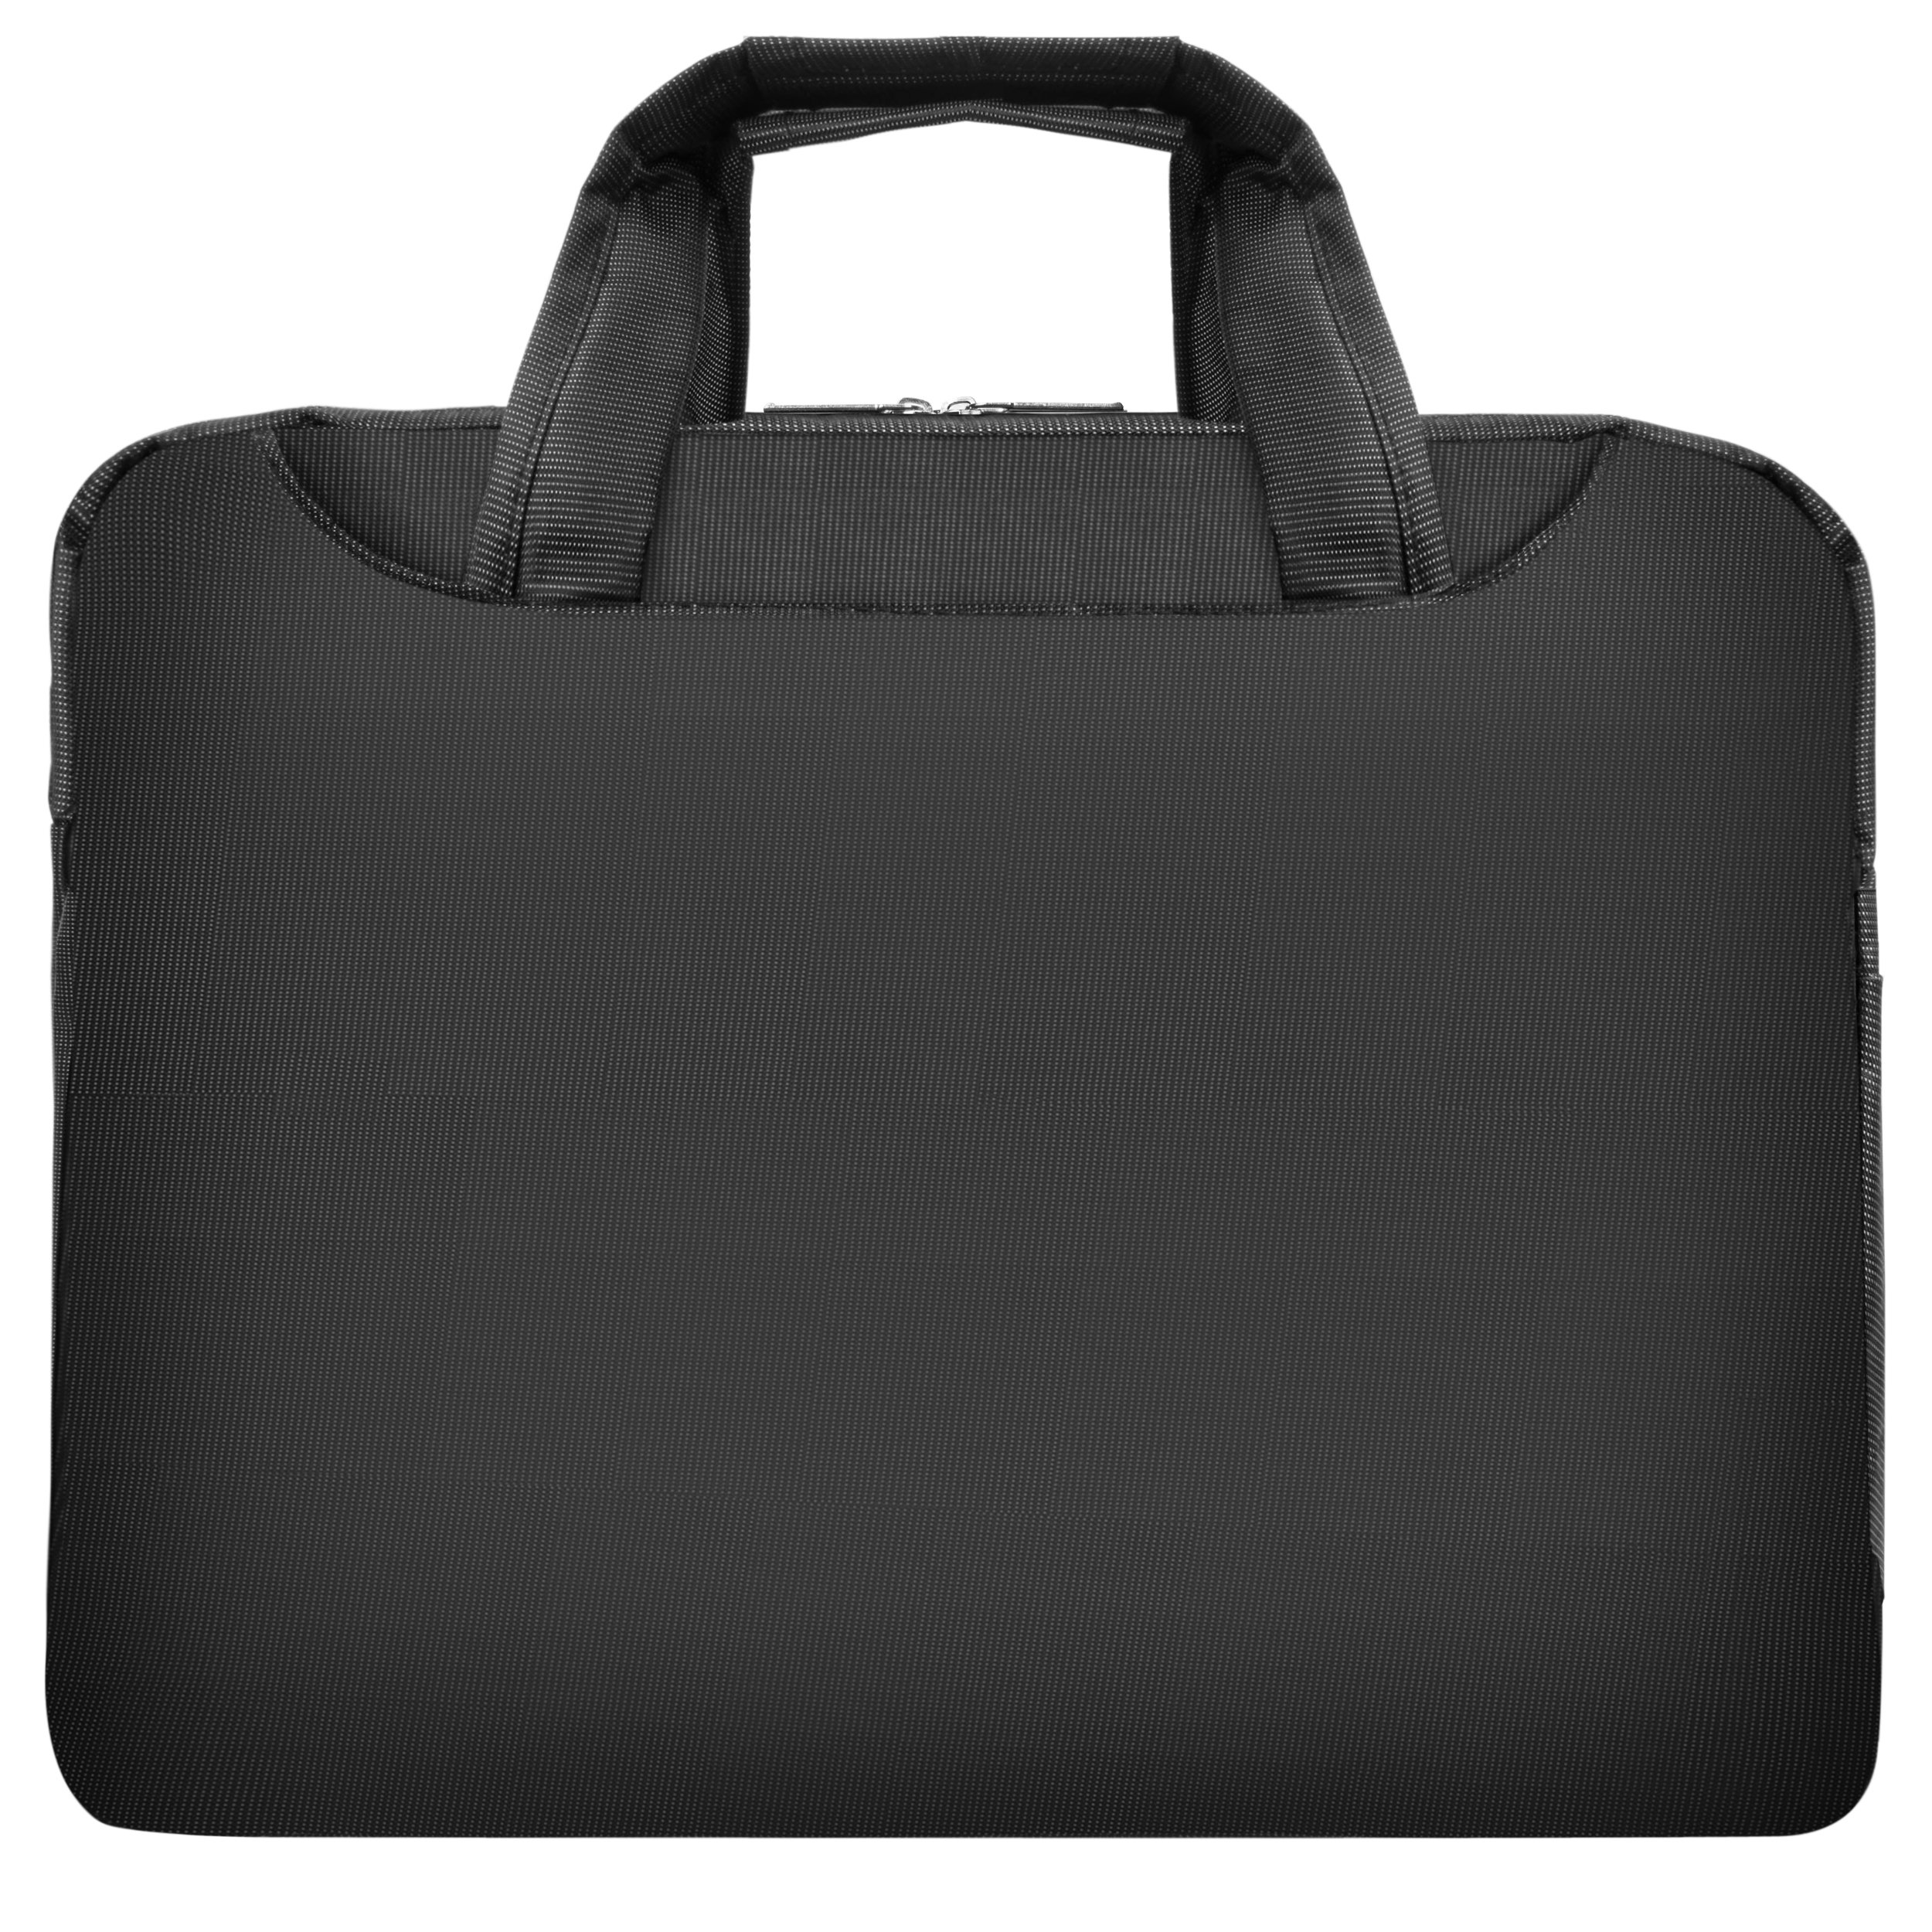 VanGoddy NineO Slim Slate Grey Messenger Bag for Microsoft Surface Laptop / Surface Book / Surface Pro Series 11''-13.5in by Vangoddy (Image #3)